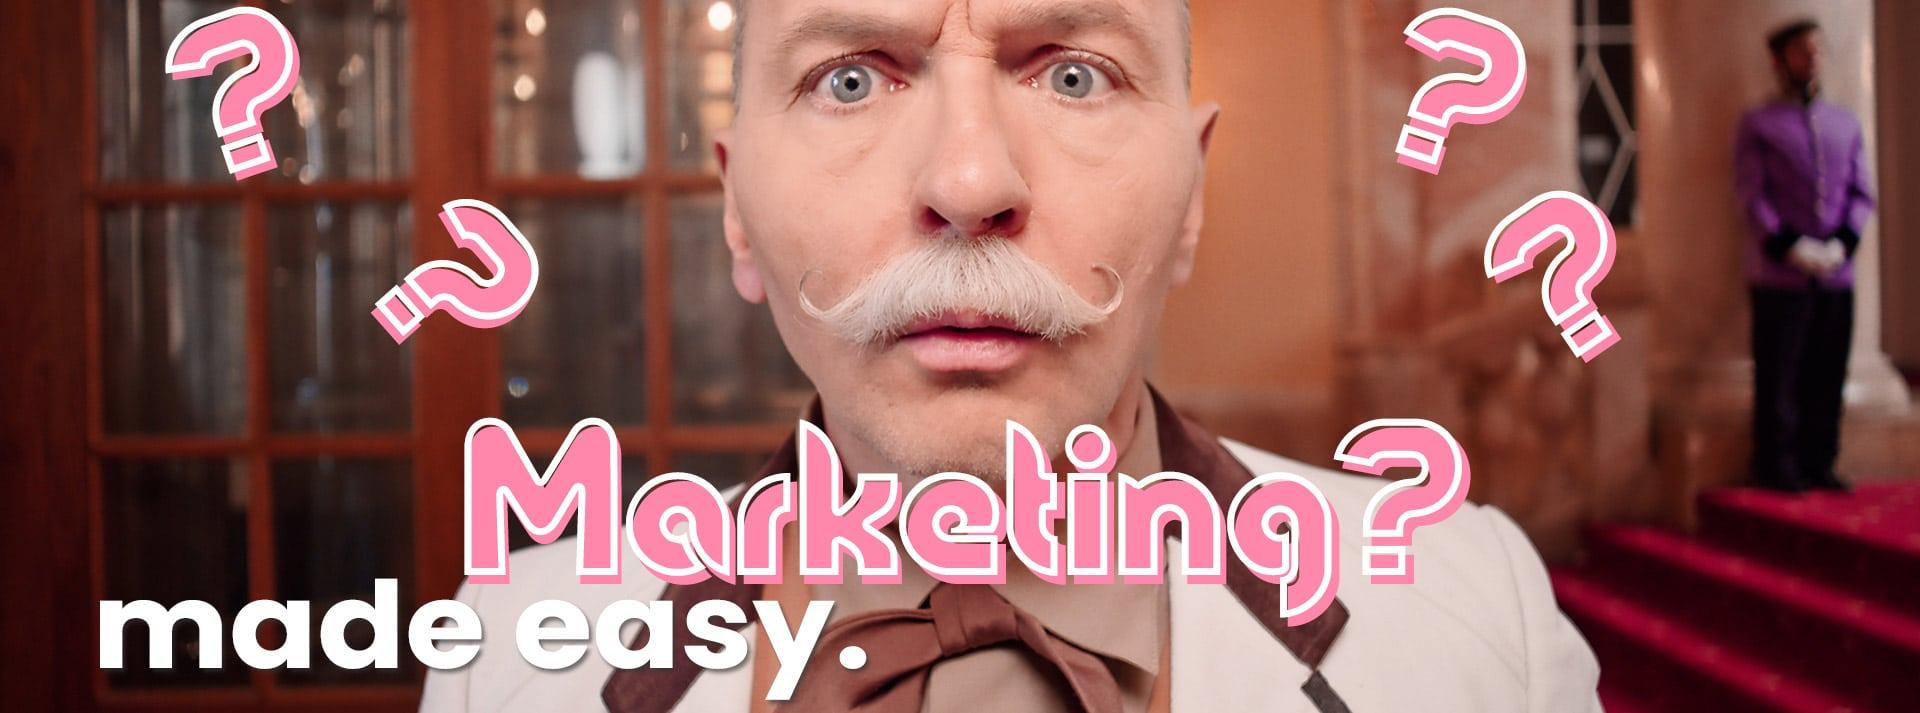 GASTROdat hotelsoftware Marketing made easy